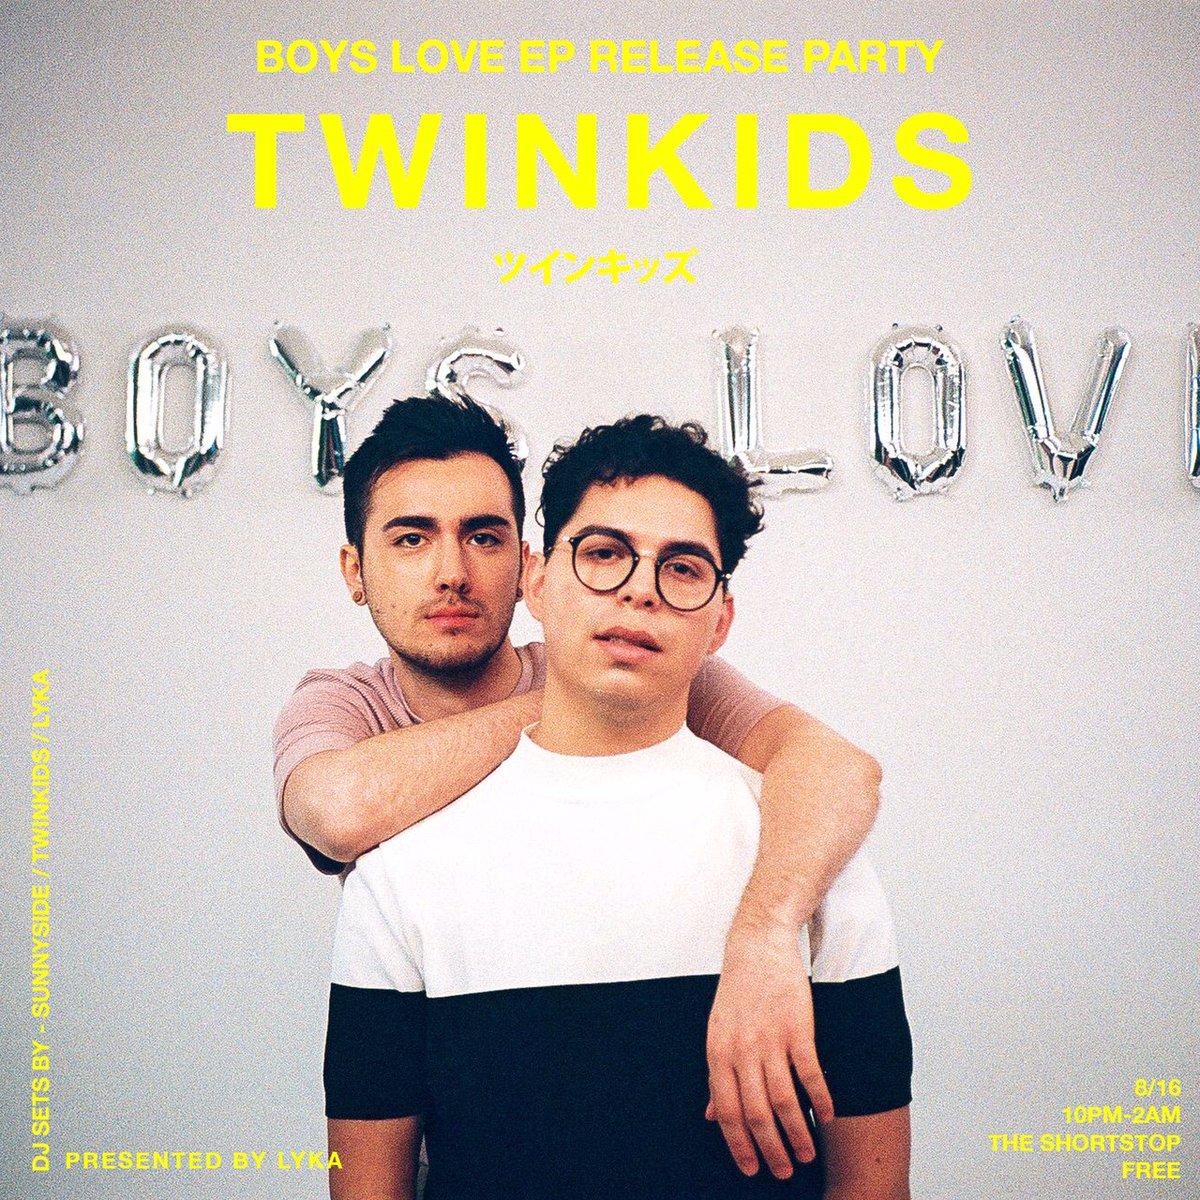 Twinkids